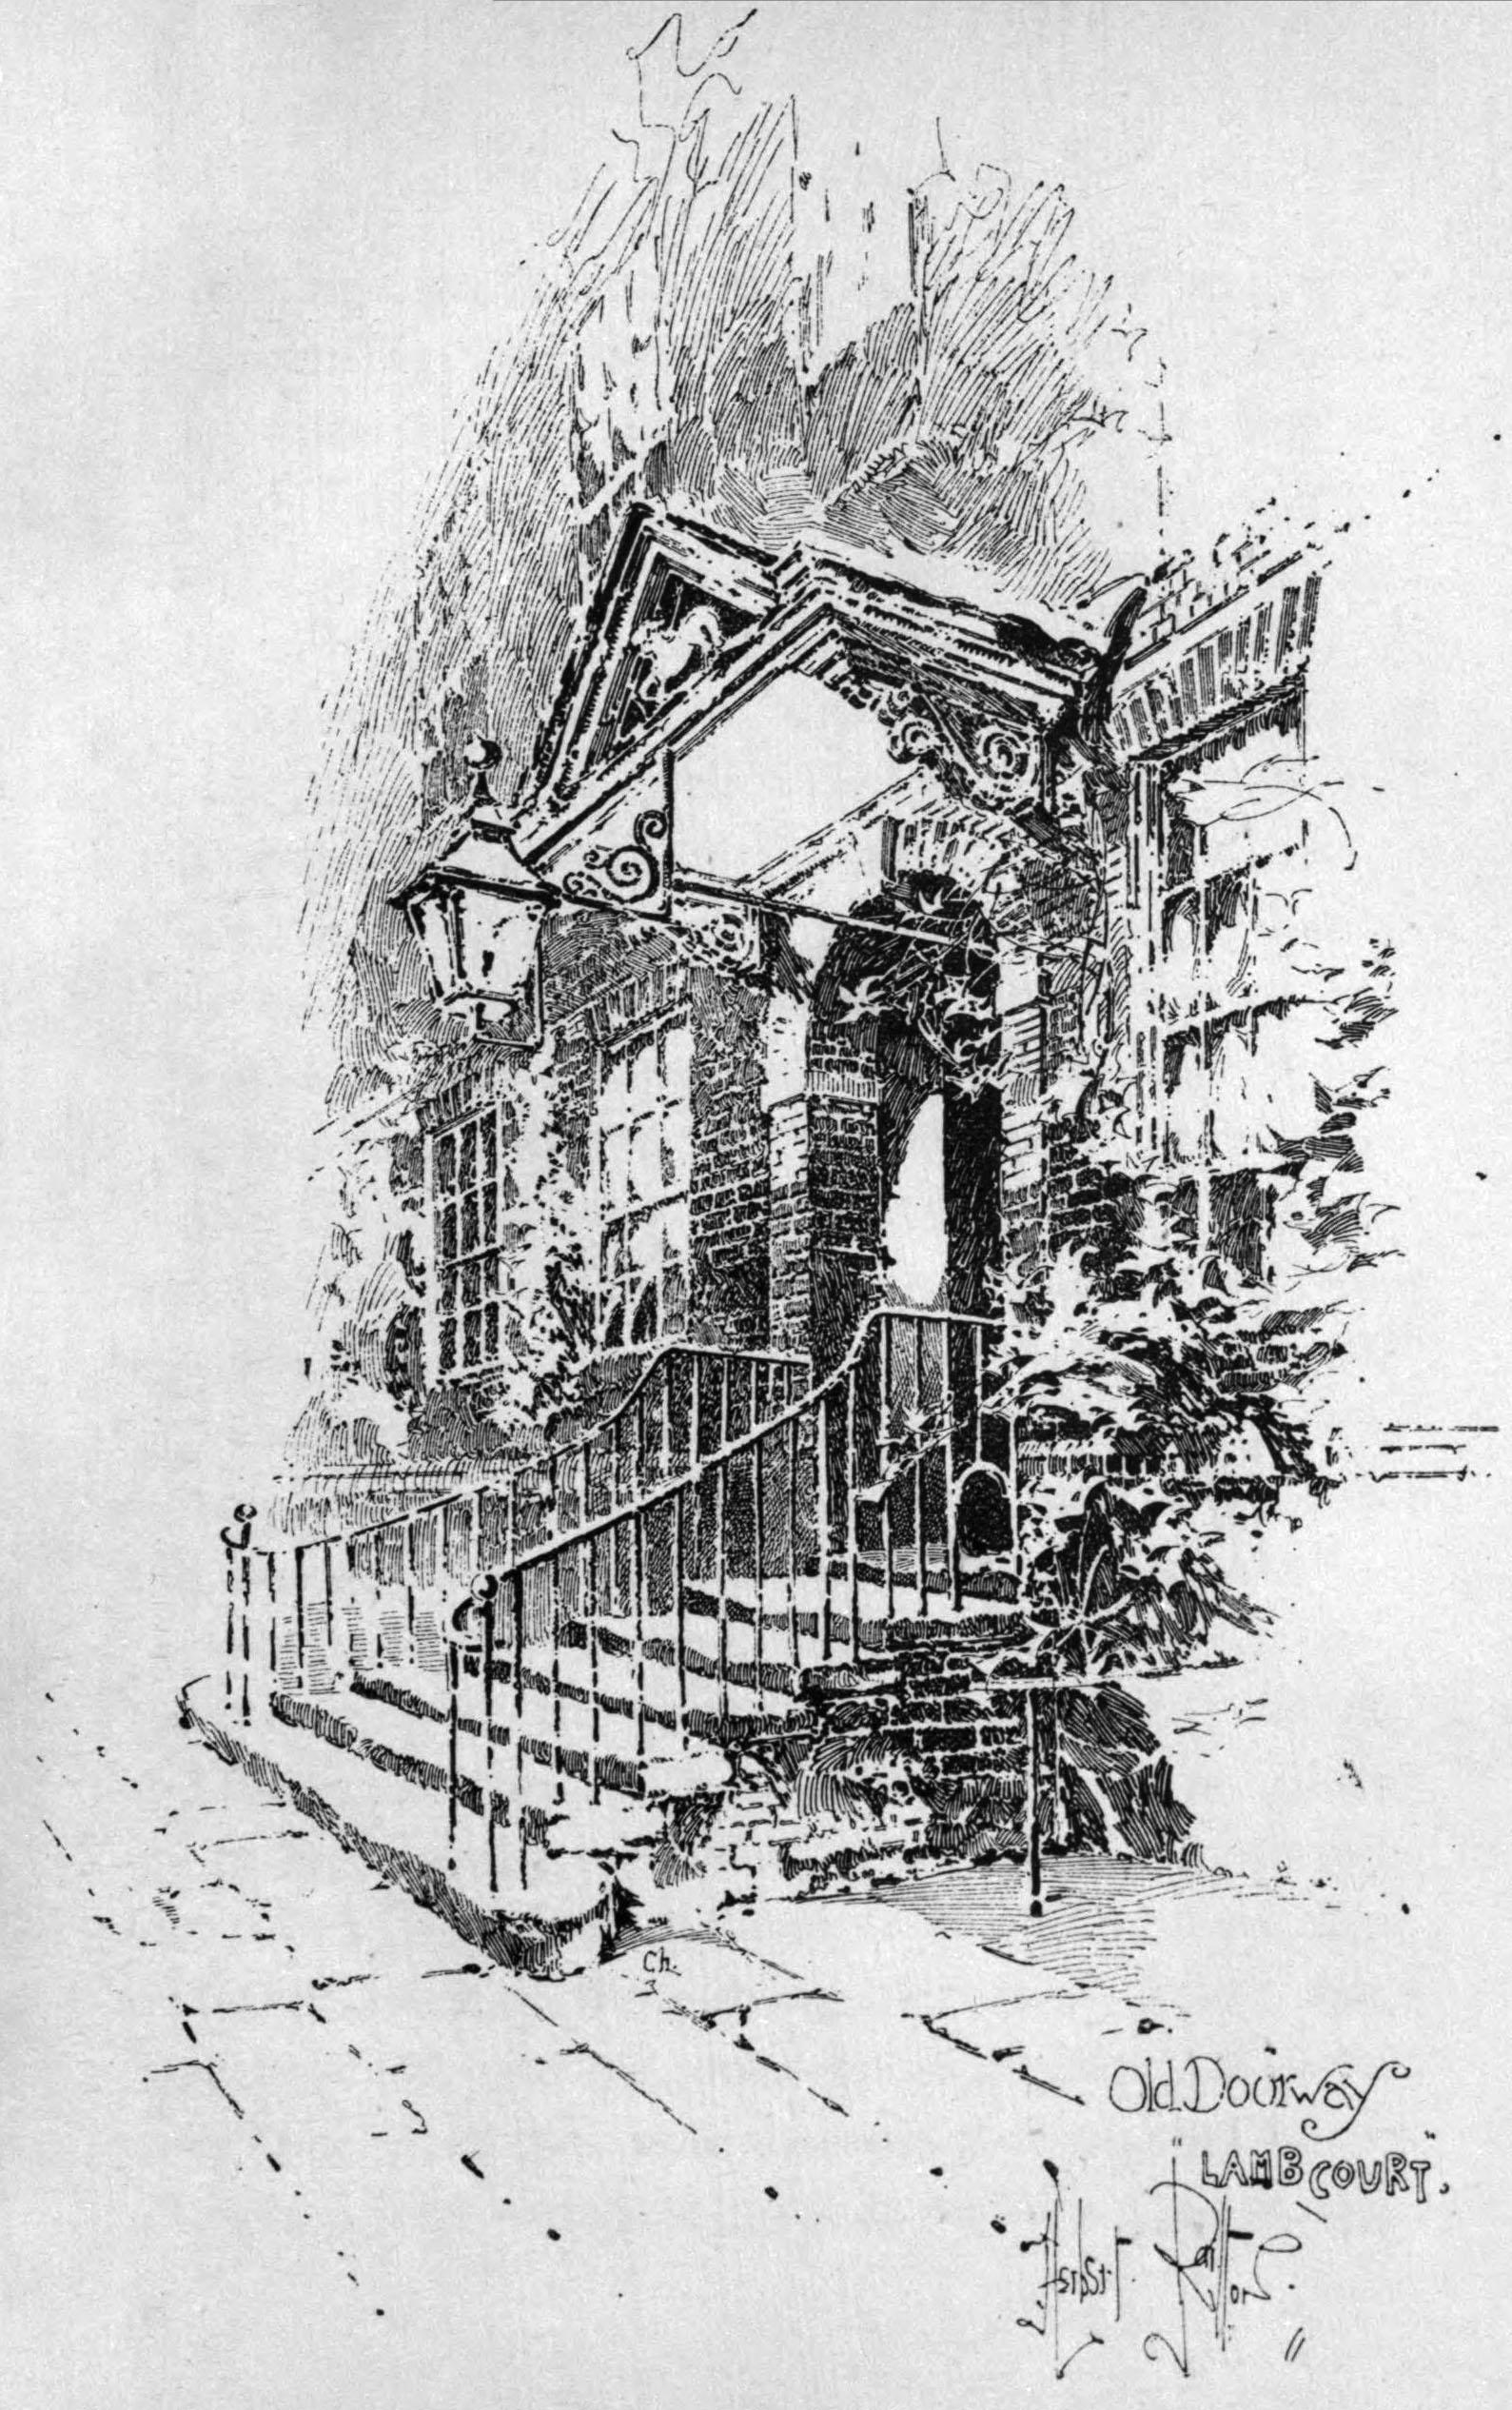 File Herbert Railton Old Doorway Lamb Court Jpg